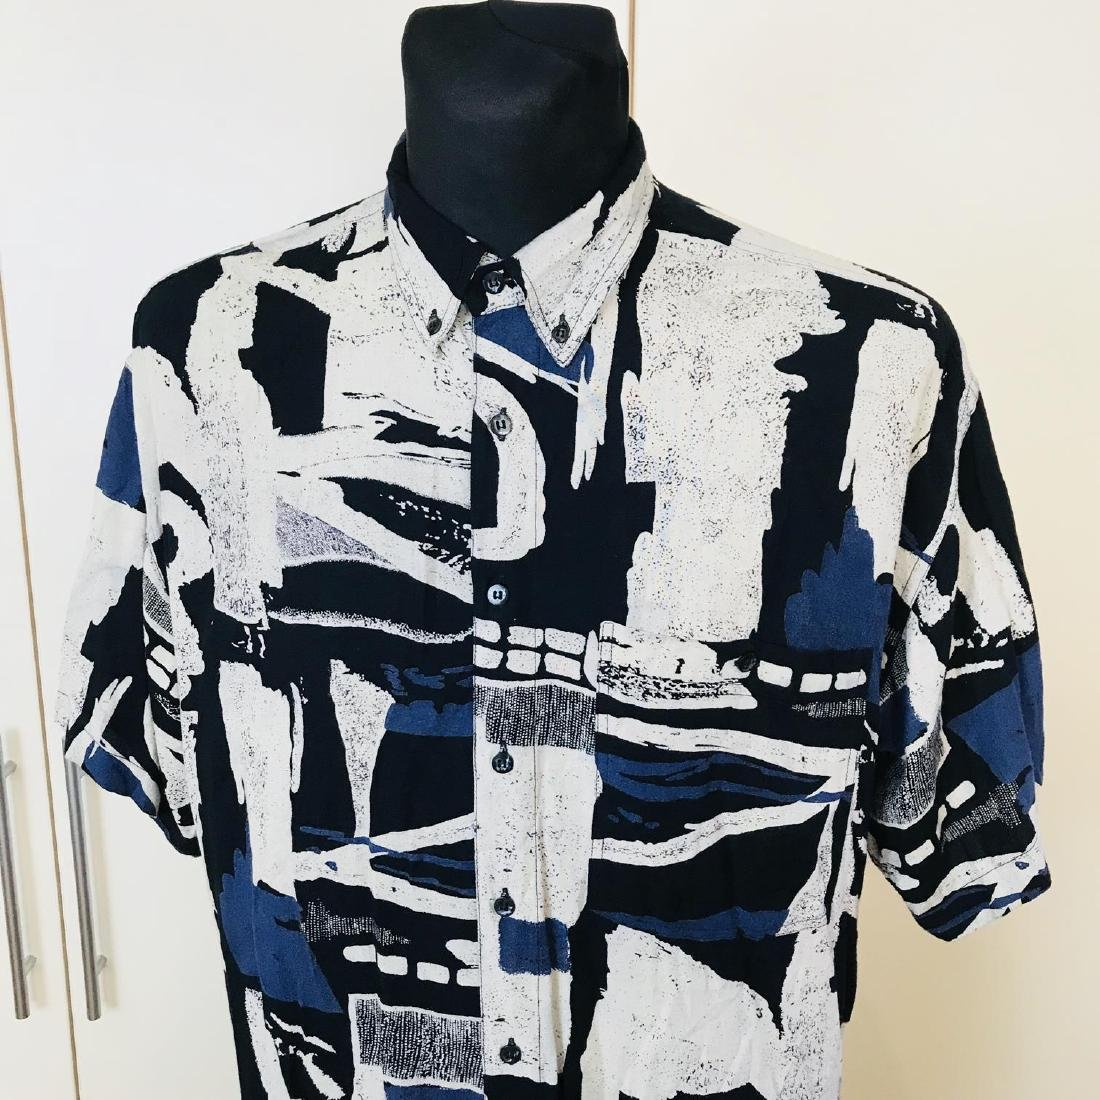 Vintage Men's DAYTON Hawaiian Shirt Top Size XL - 3